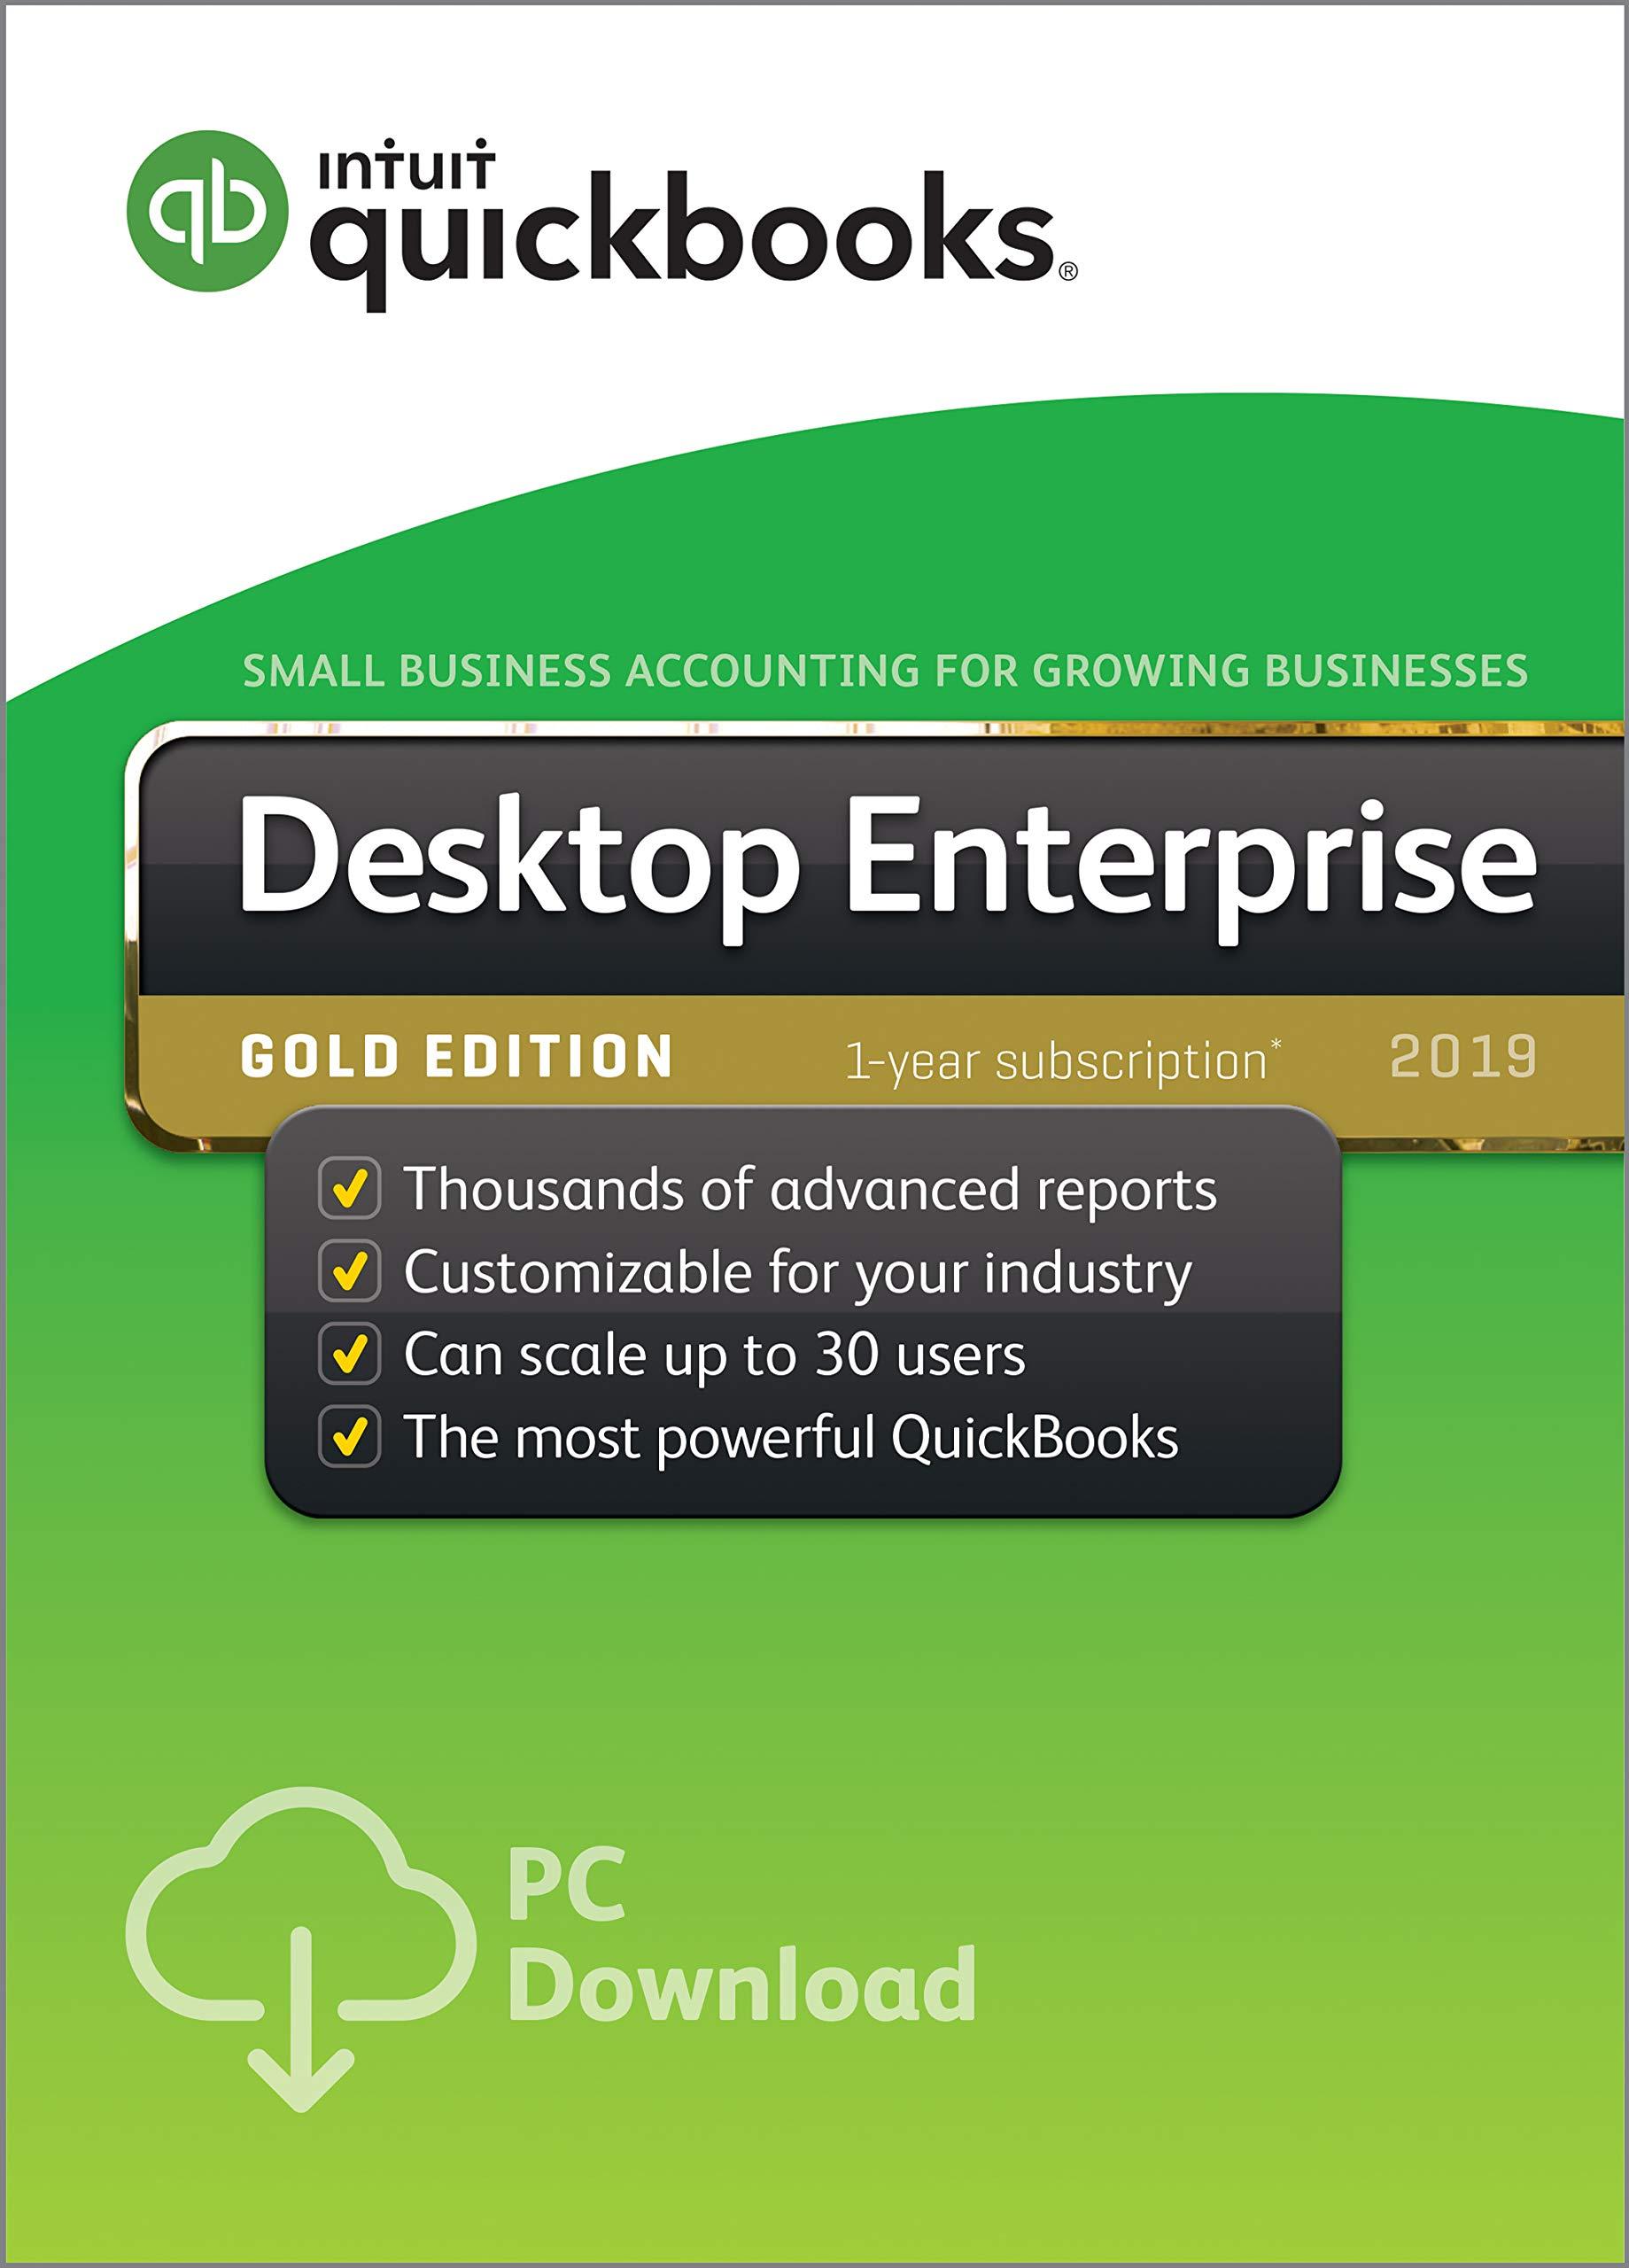 QuickBooks Desktop Enterprise Gold 2019,1 user, 1 Year Subscription [PC Download] by Intuit